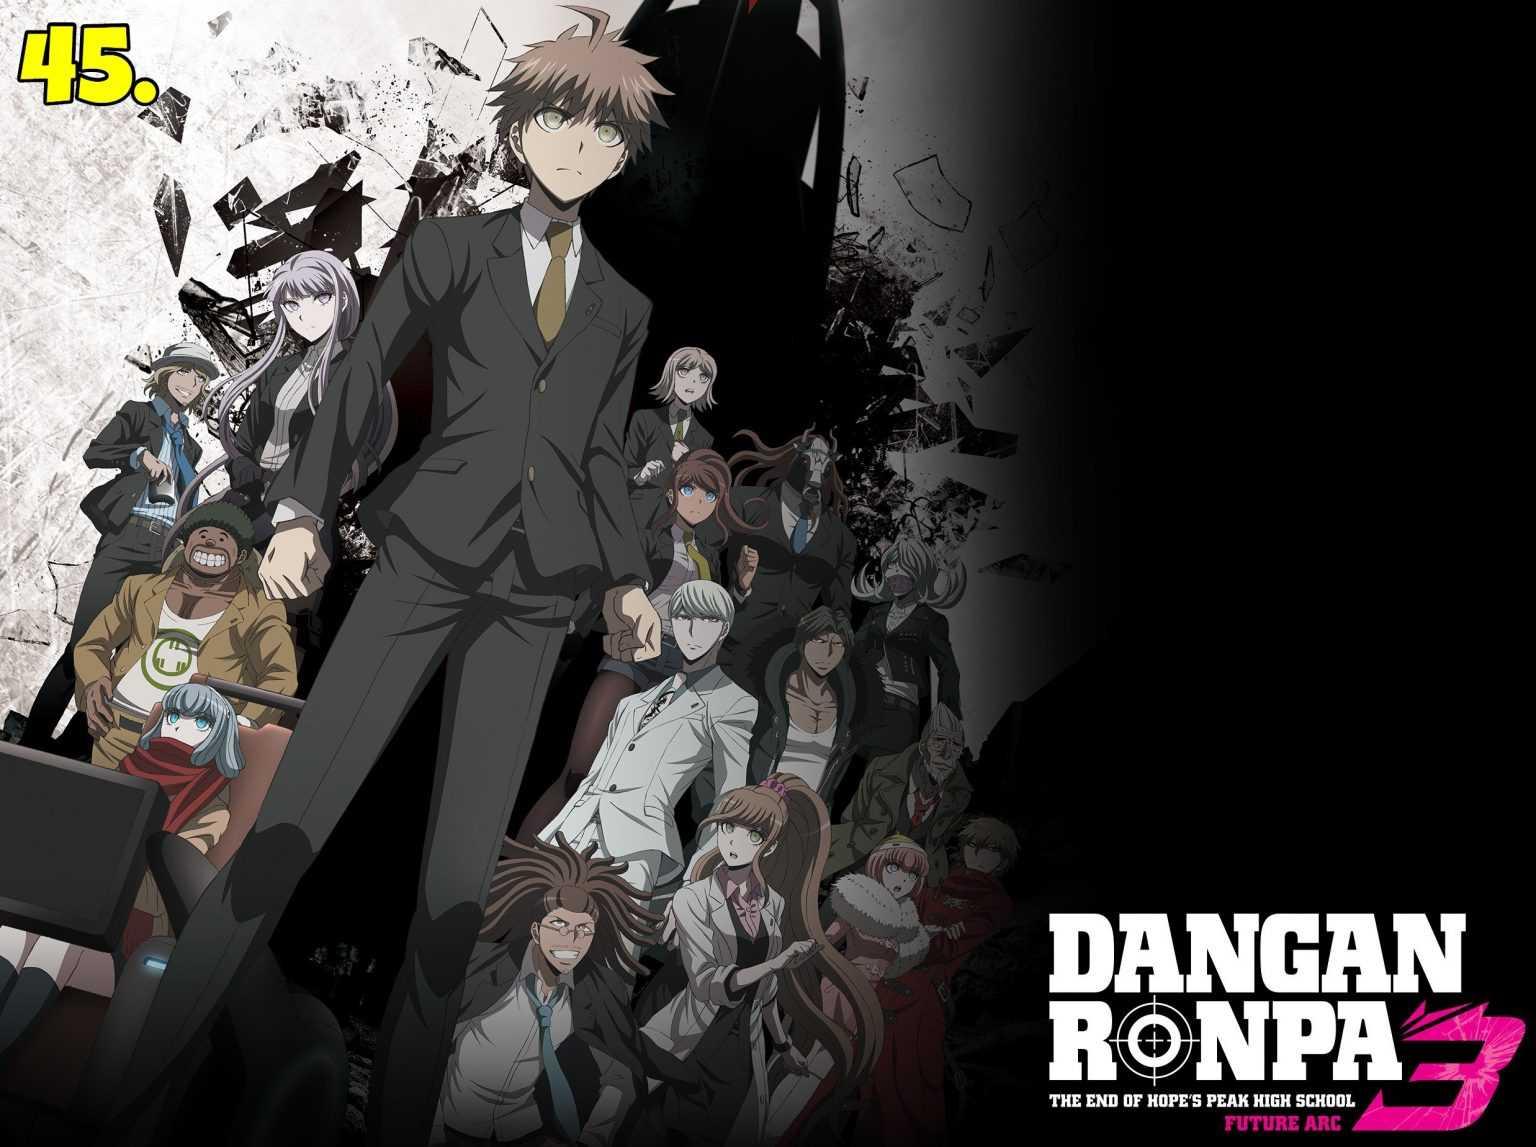 Danganronpa-3-The-End-of-Hopes-Peak-High-School